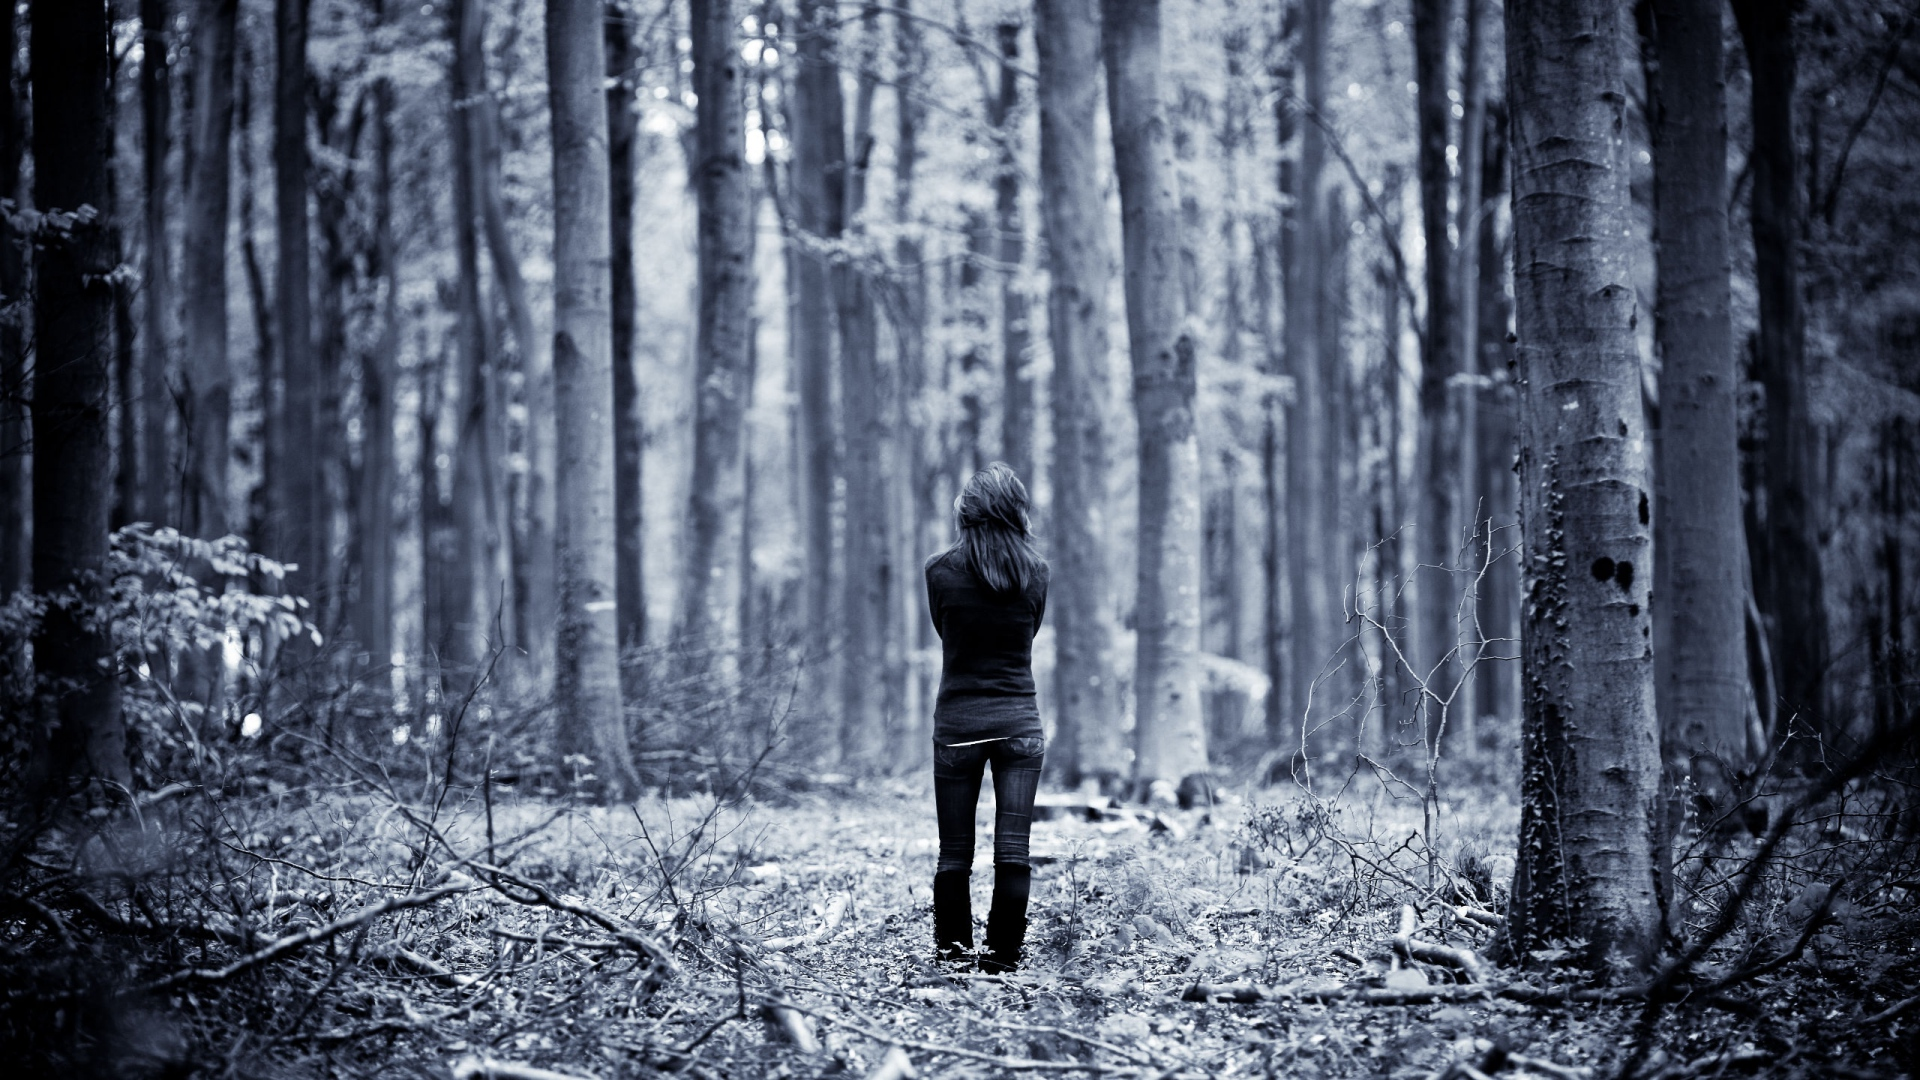 Download Wallpaper Forest Girl - girl_forest_walk_rain_55048_1920x1080  Snapshot_121024 .jpg